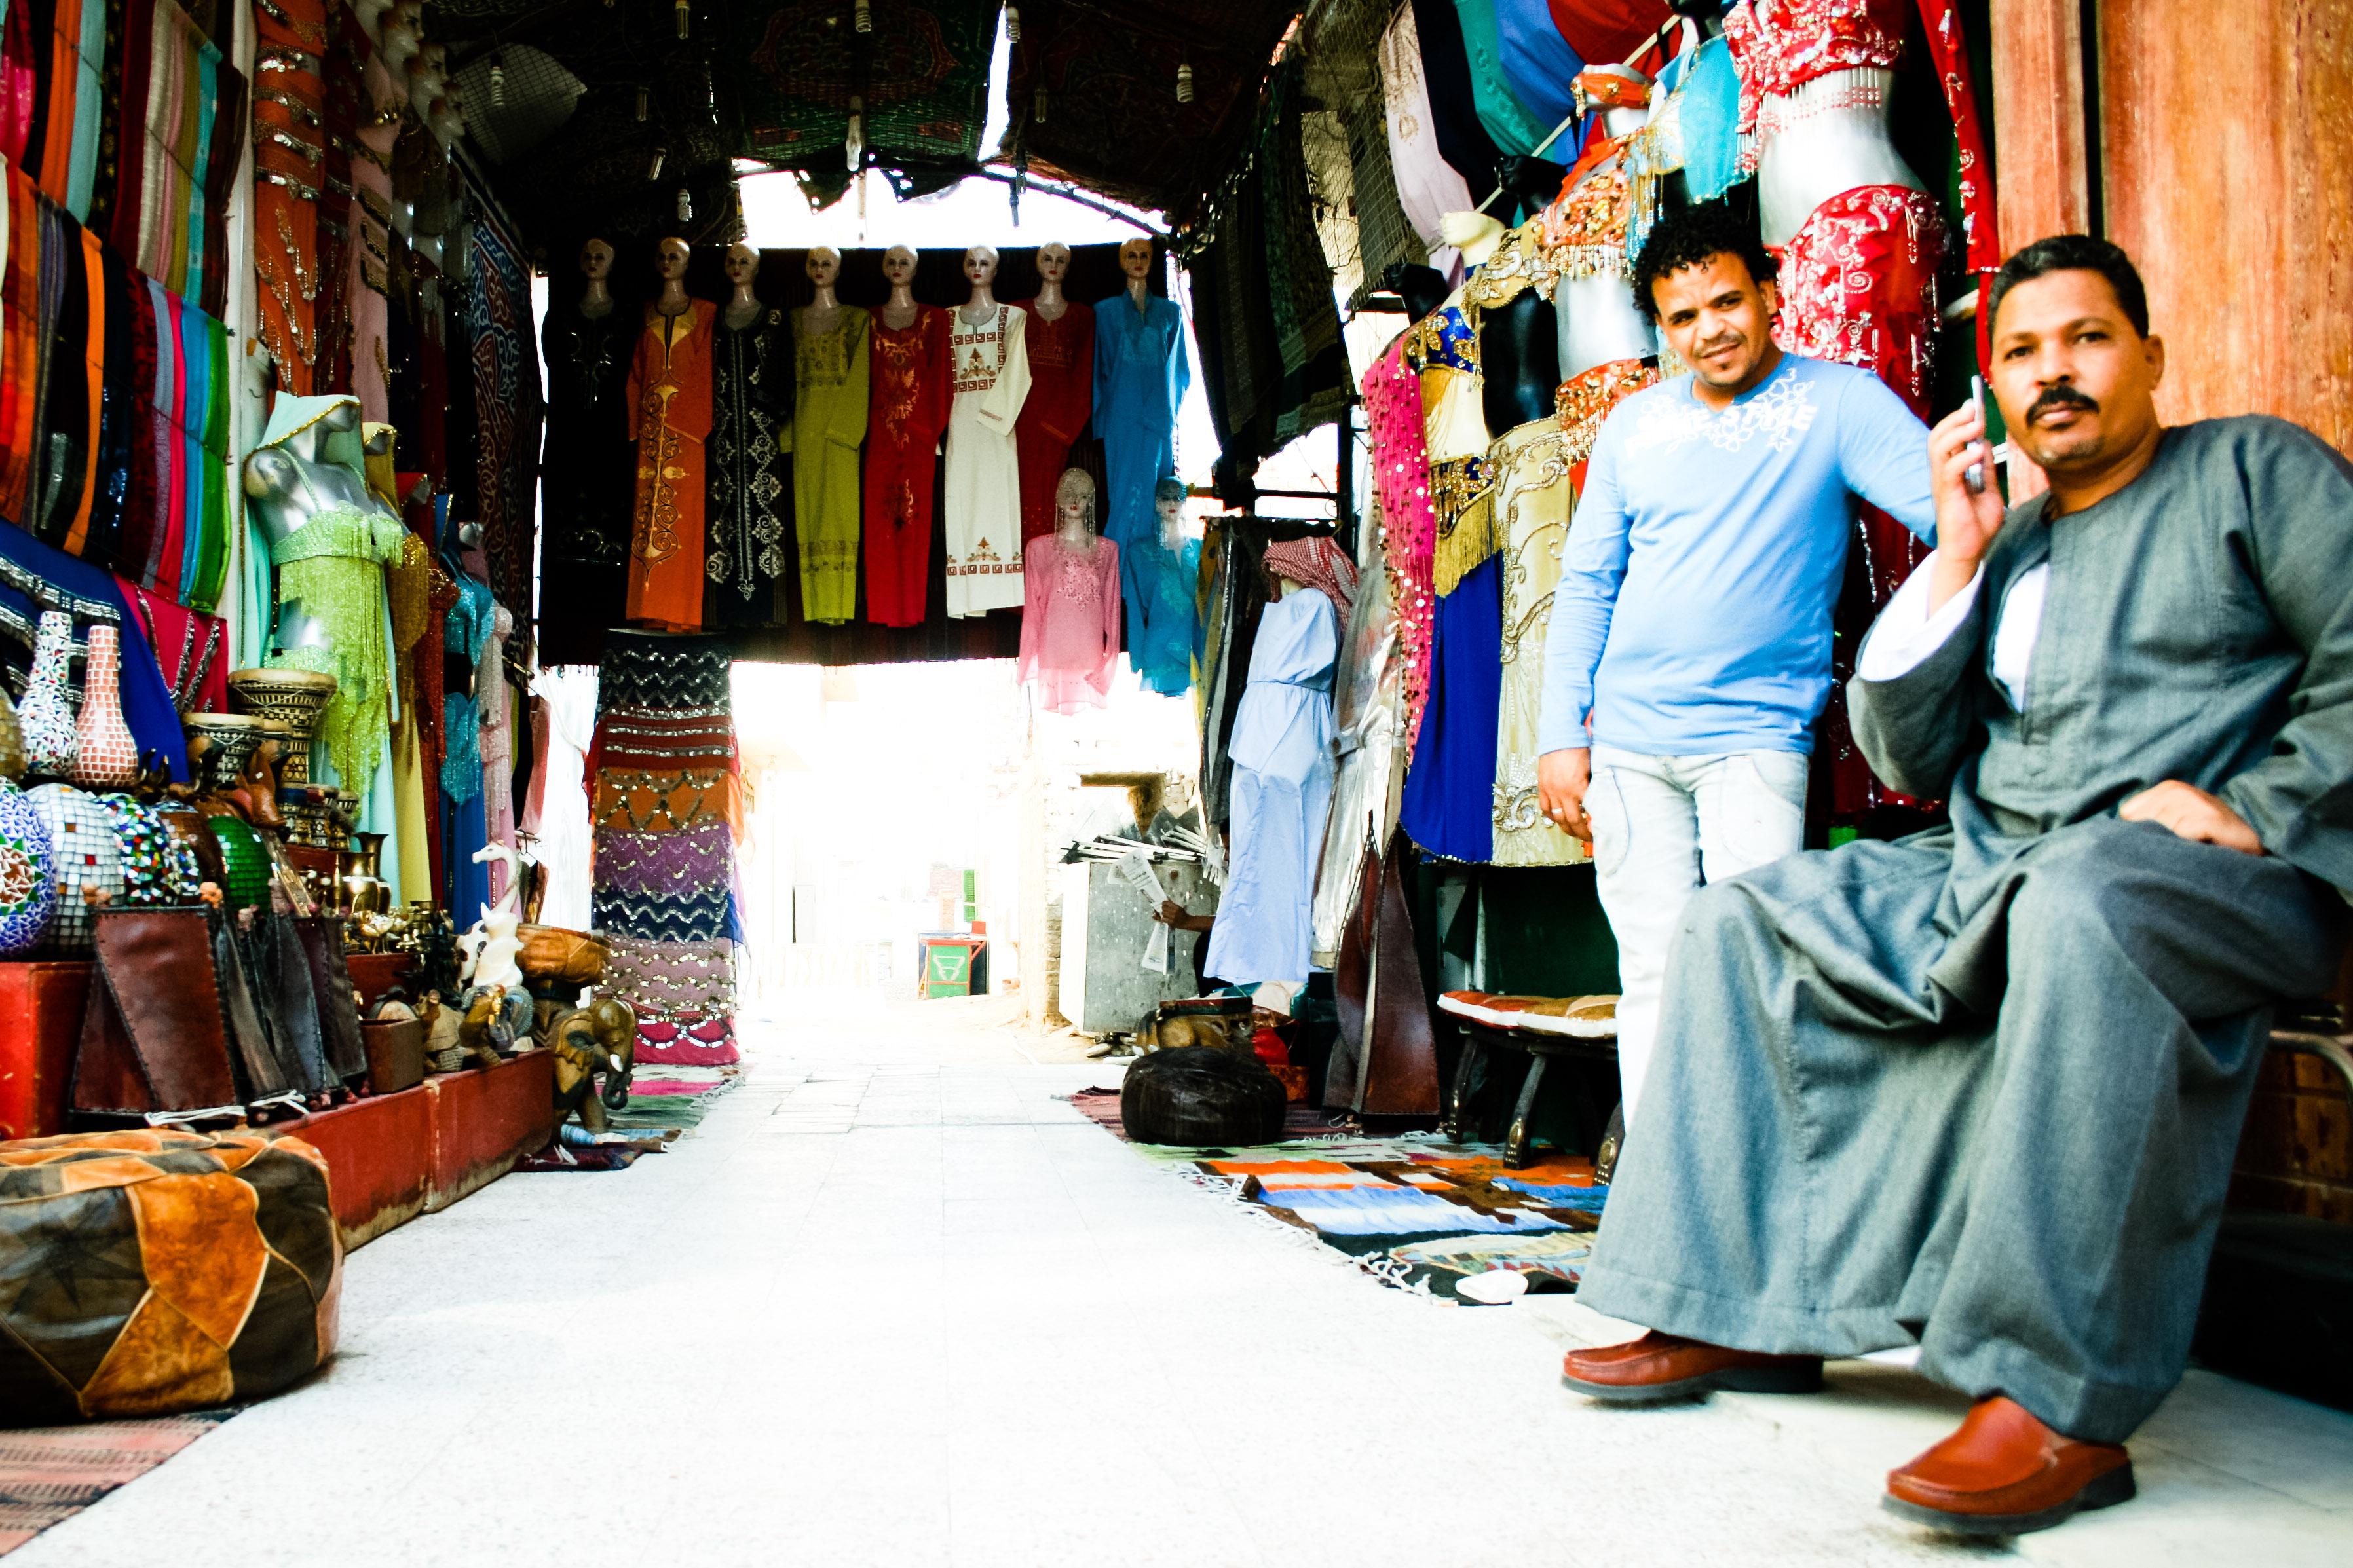 Arabic man and shop photo